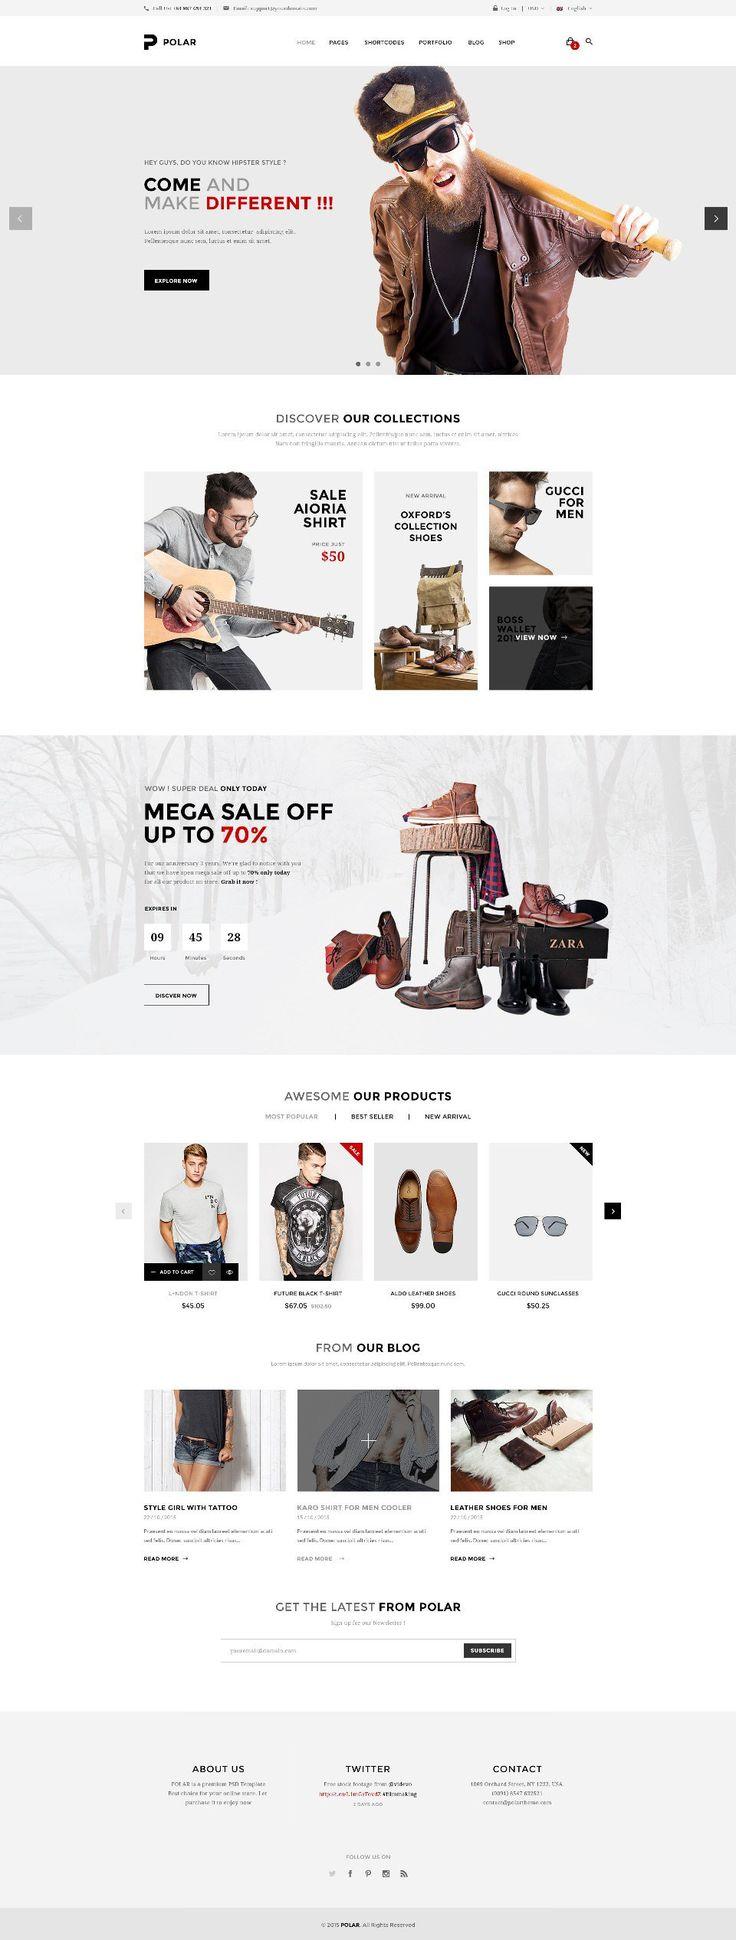 Polar Web Design Inspiration by Loancee